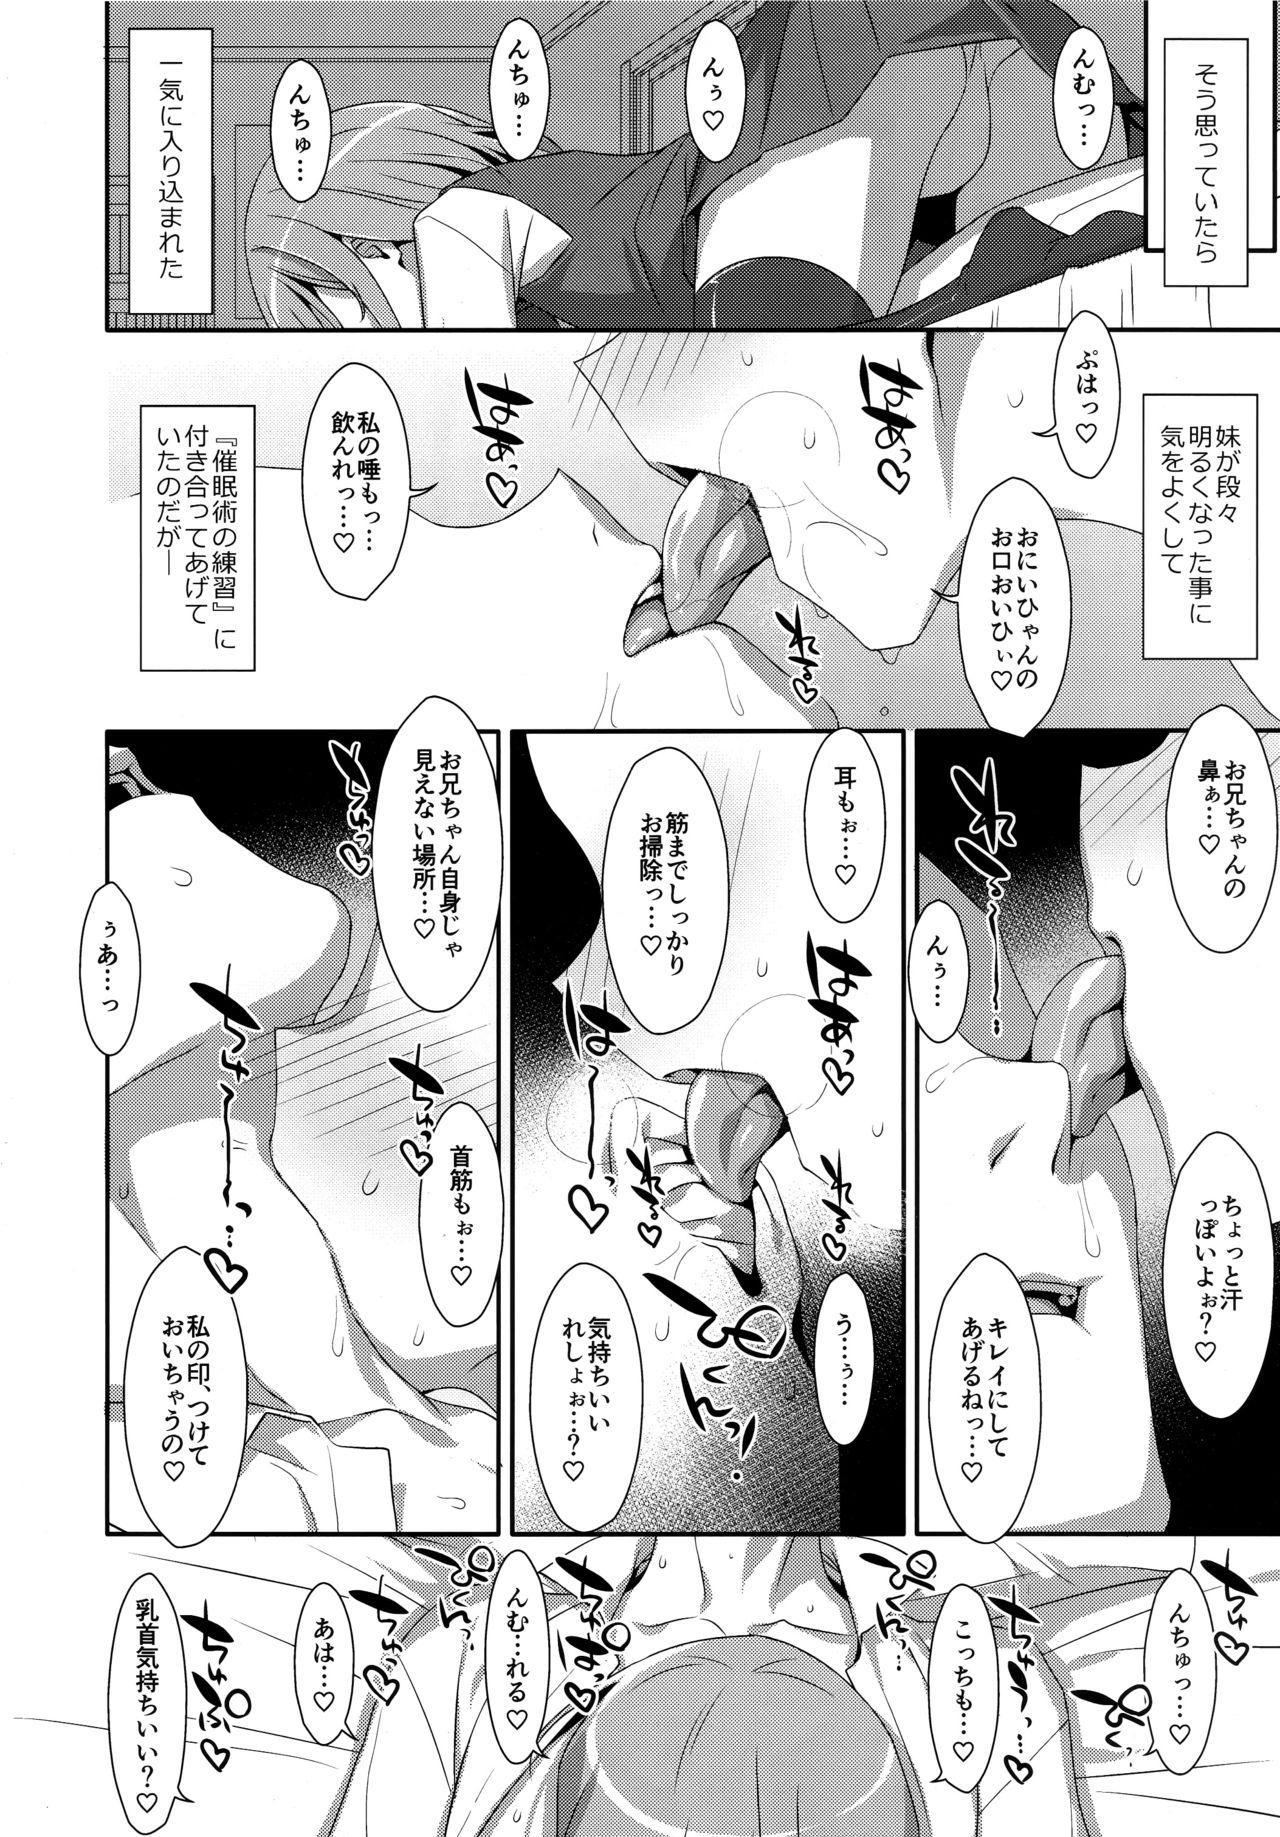 (C96) [TIES (Takei Ooki)] Neteiru (?) Onii-chan ni Iroiro Shitai! 6